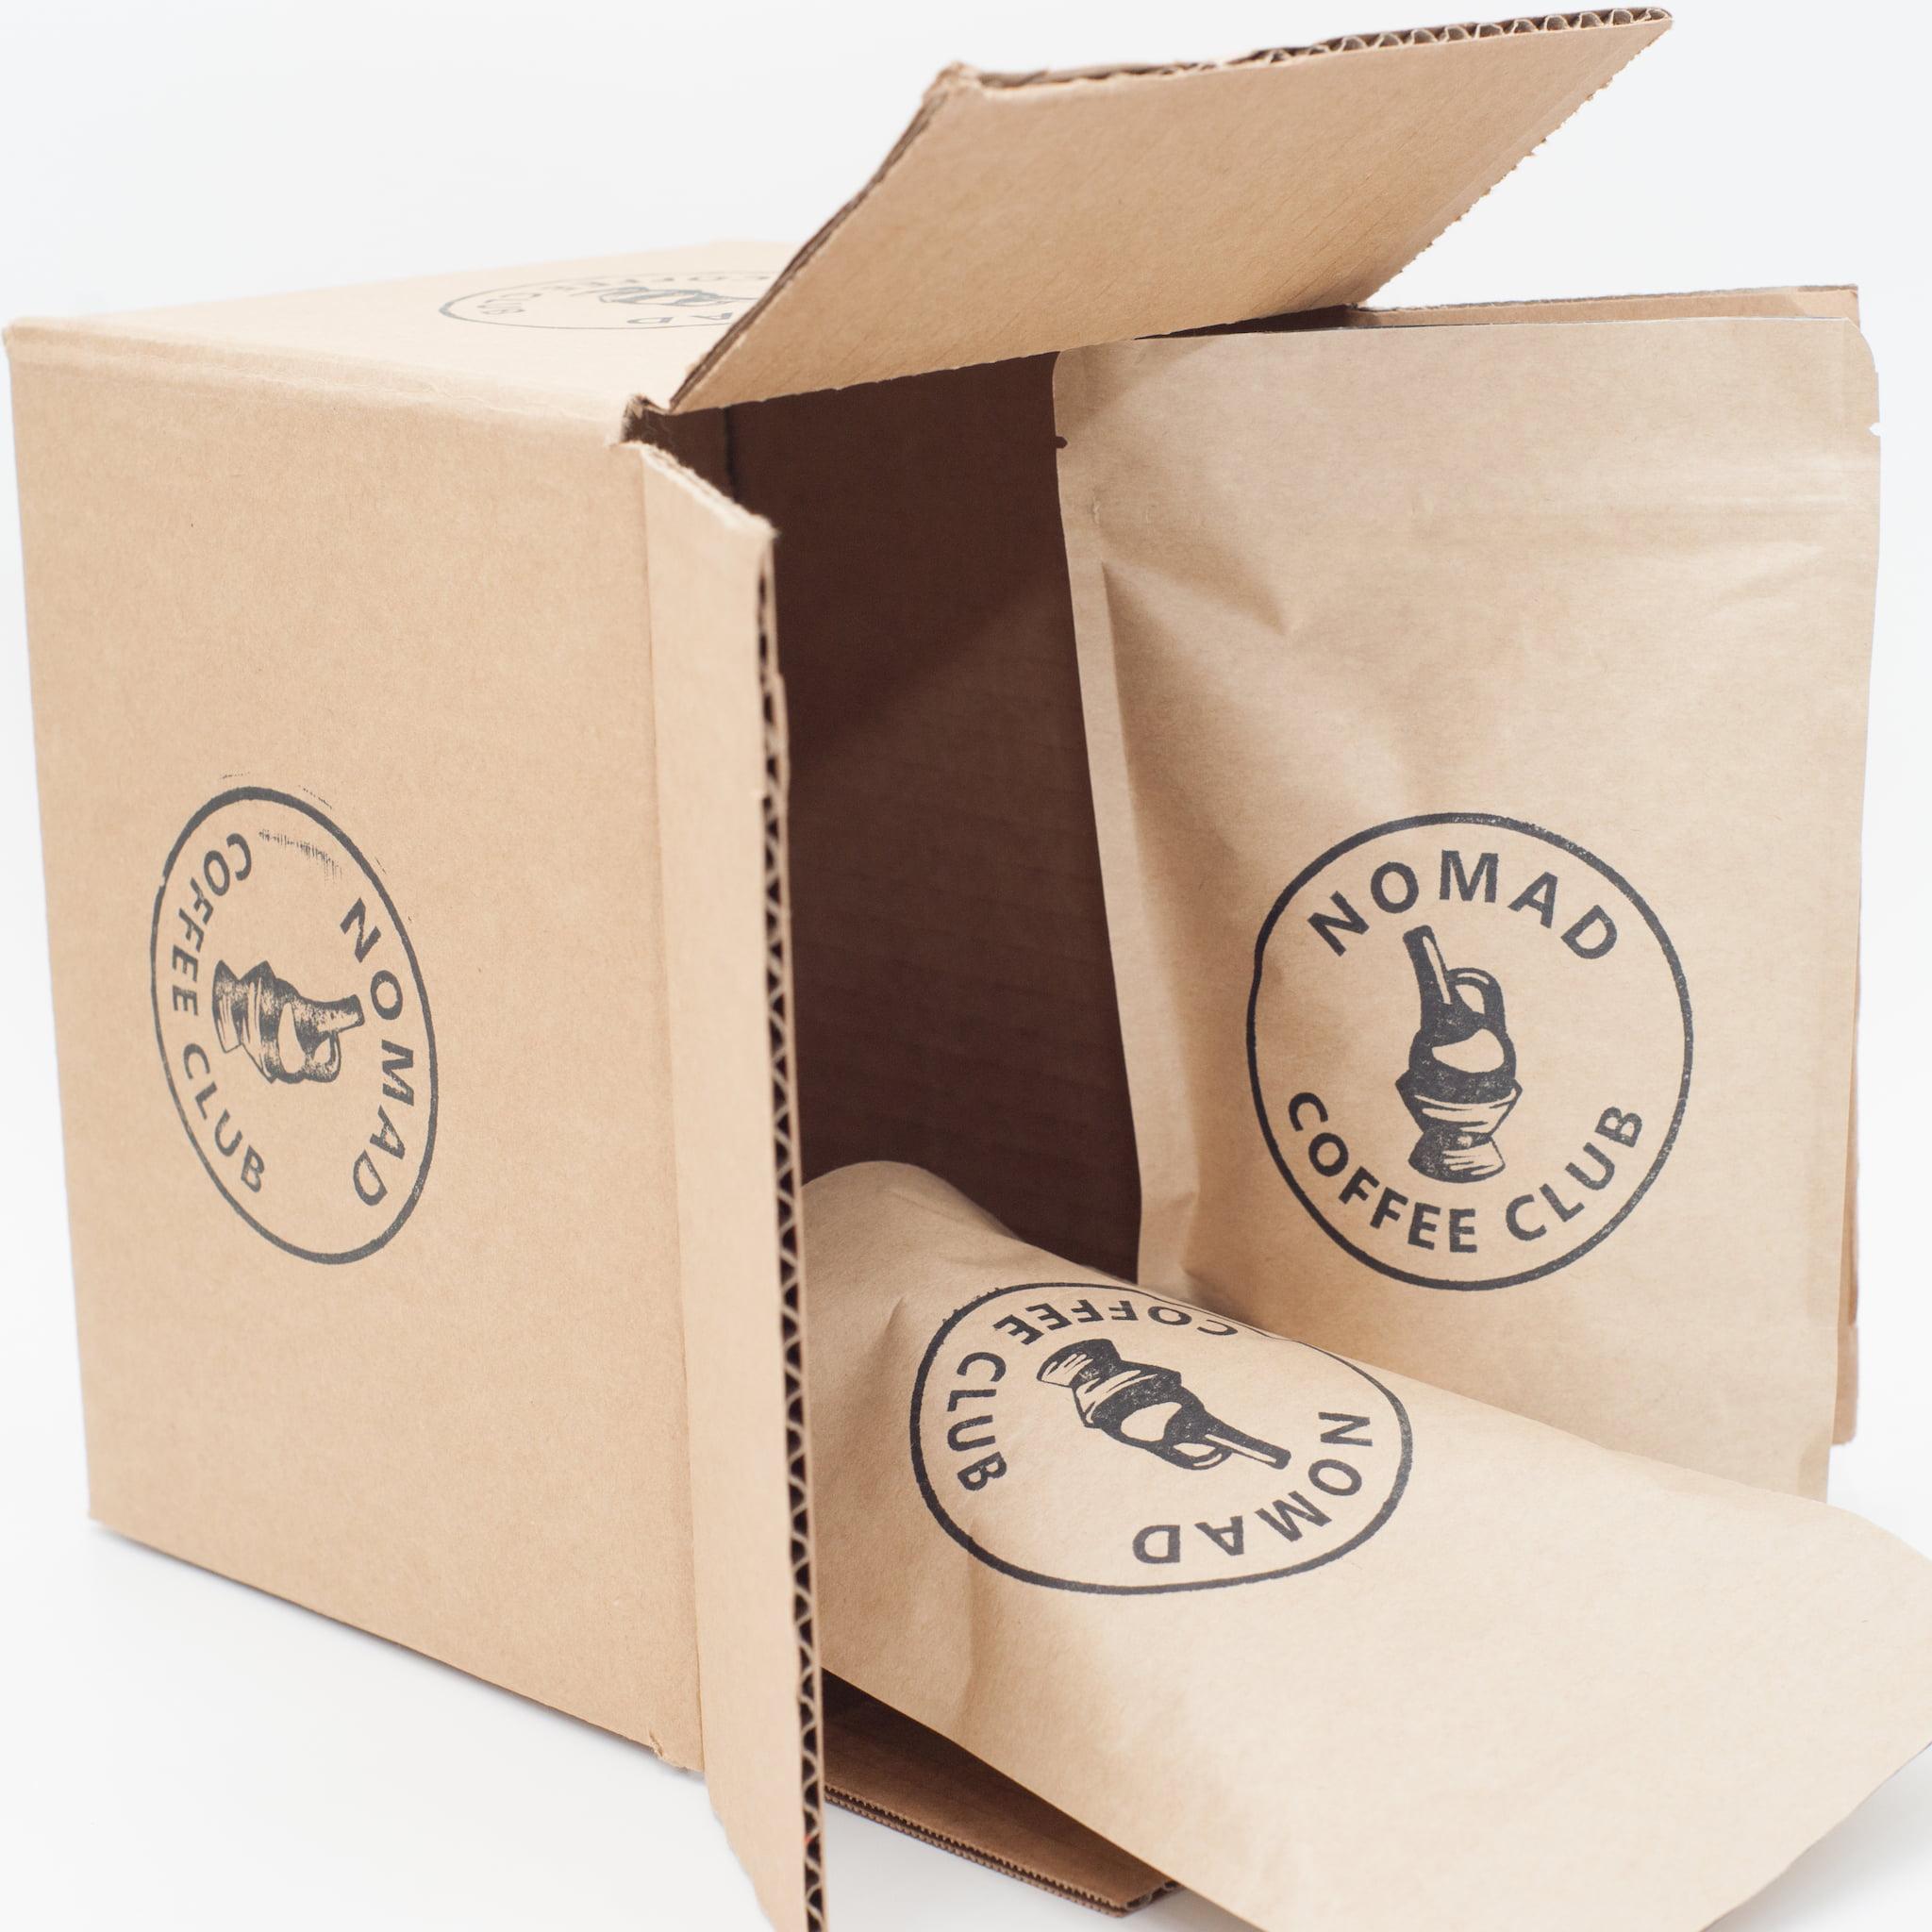 "Nomad Coffee Club ""Dark Roast Coffee Lovers"" Variety Box, Dark Roast, 6 Oz, 2 Bags"